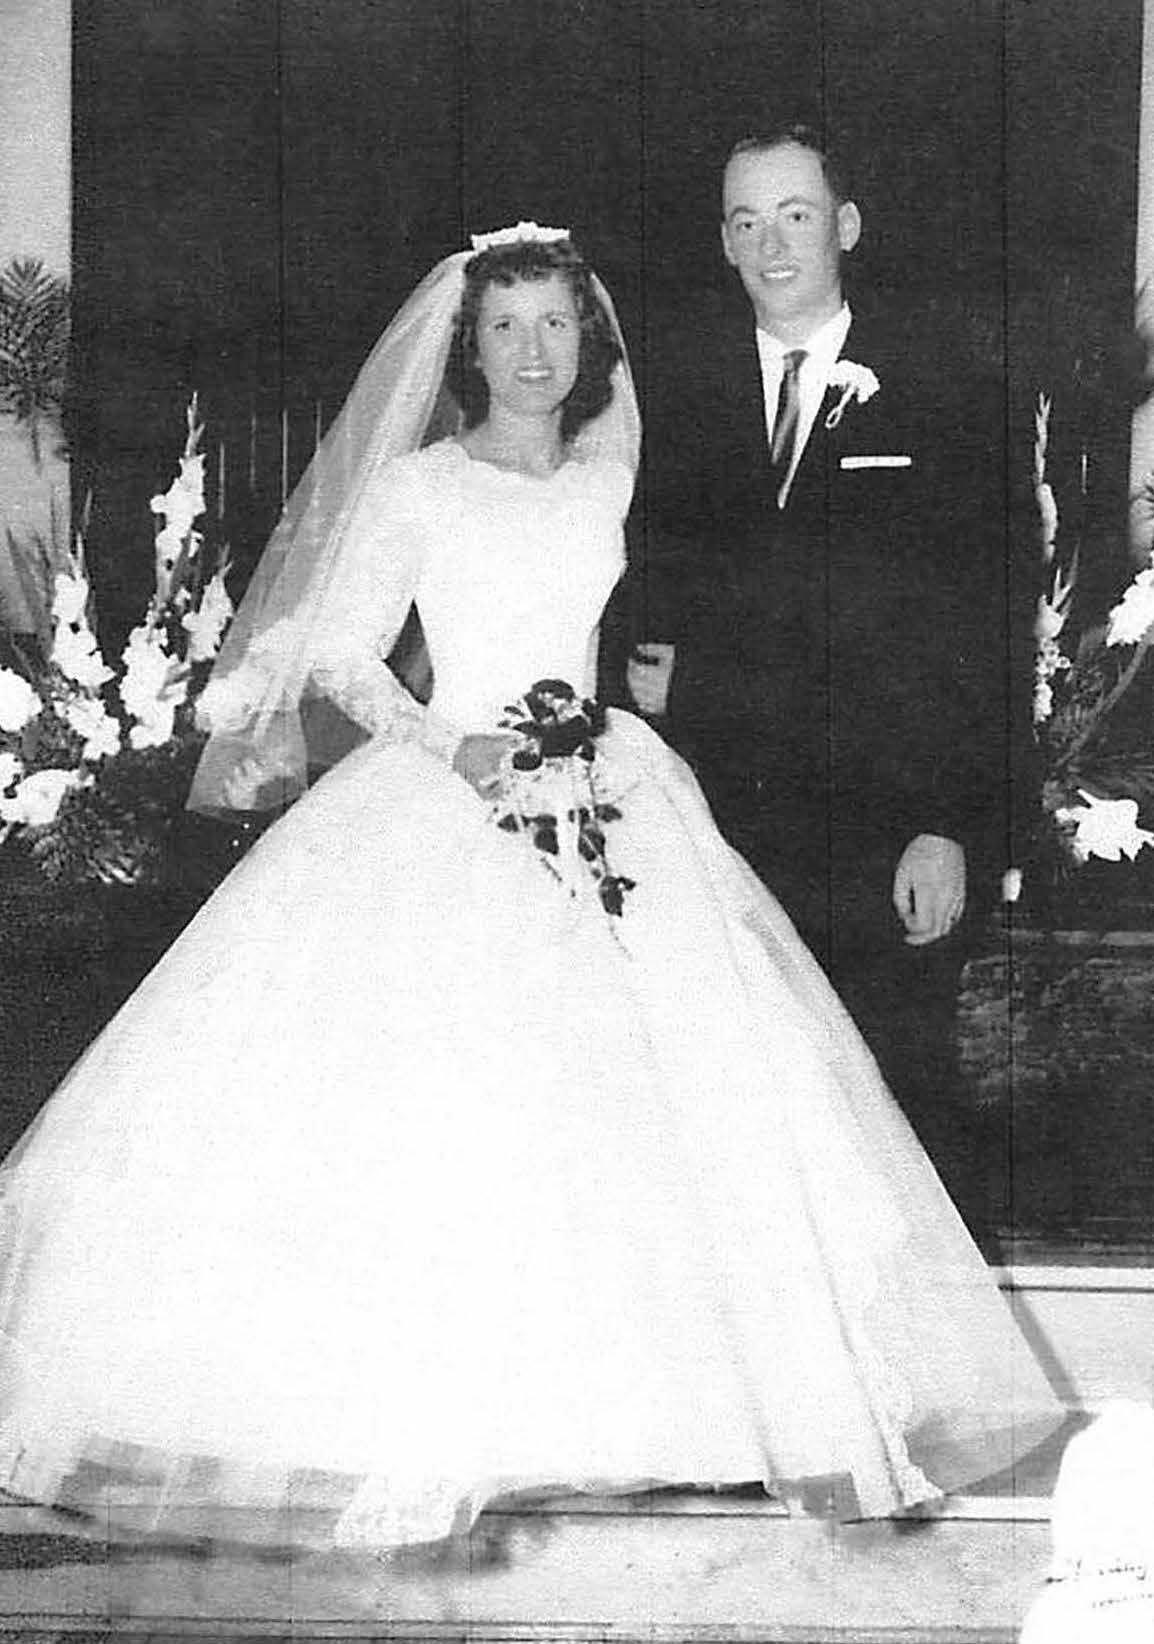 Raymond and Marjorie Gottman YOUNGER